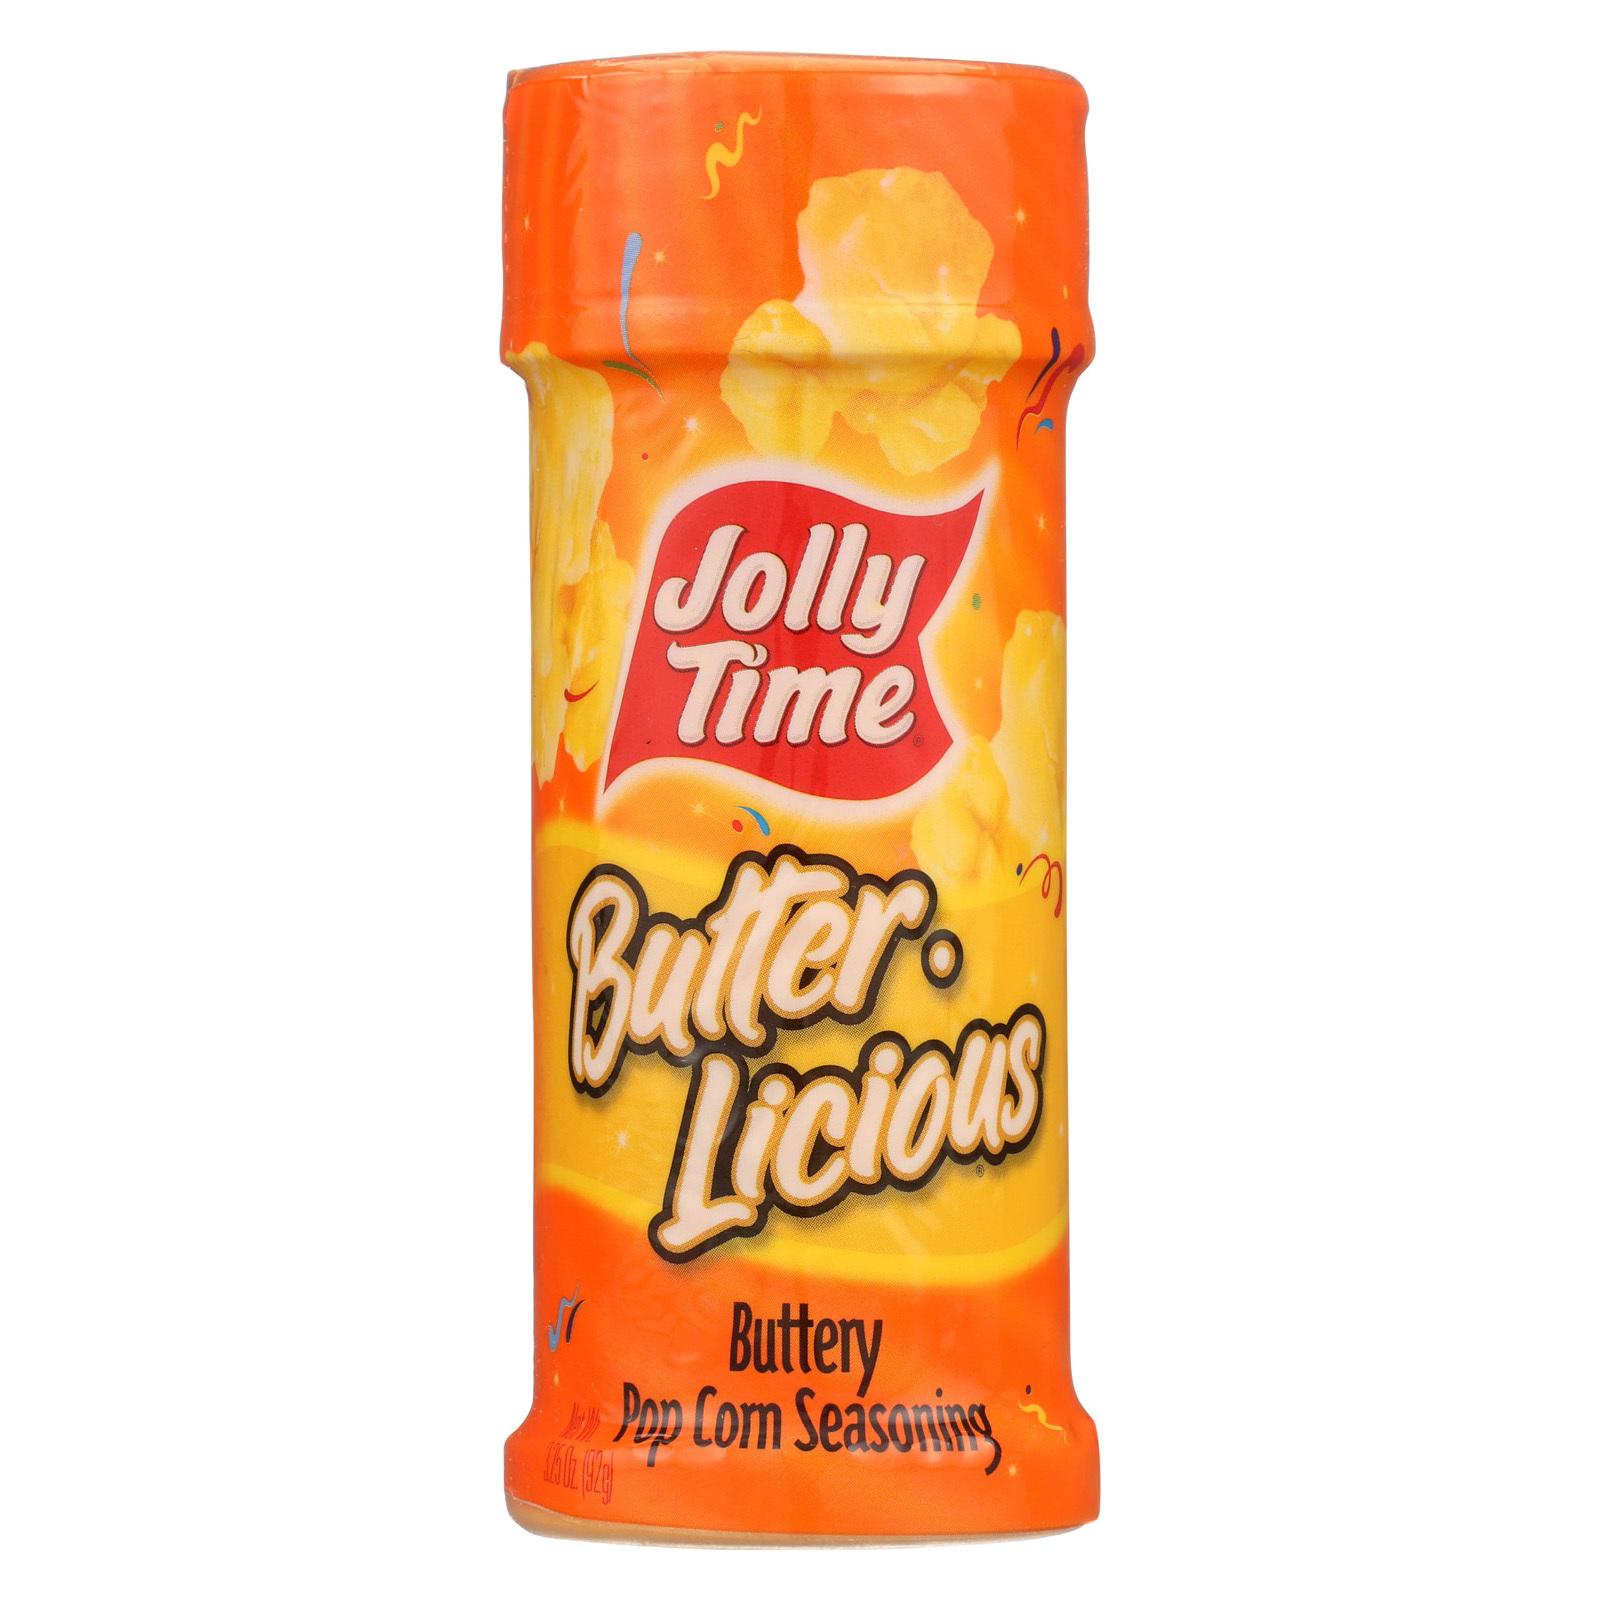 Jolly Time Popcorn Seasoning - Butter - Case of 6 - 3.25 oz